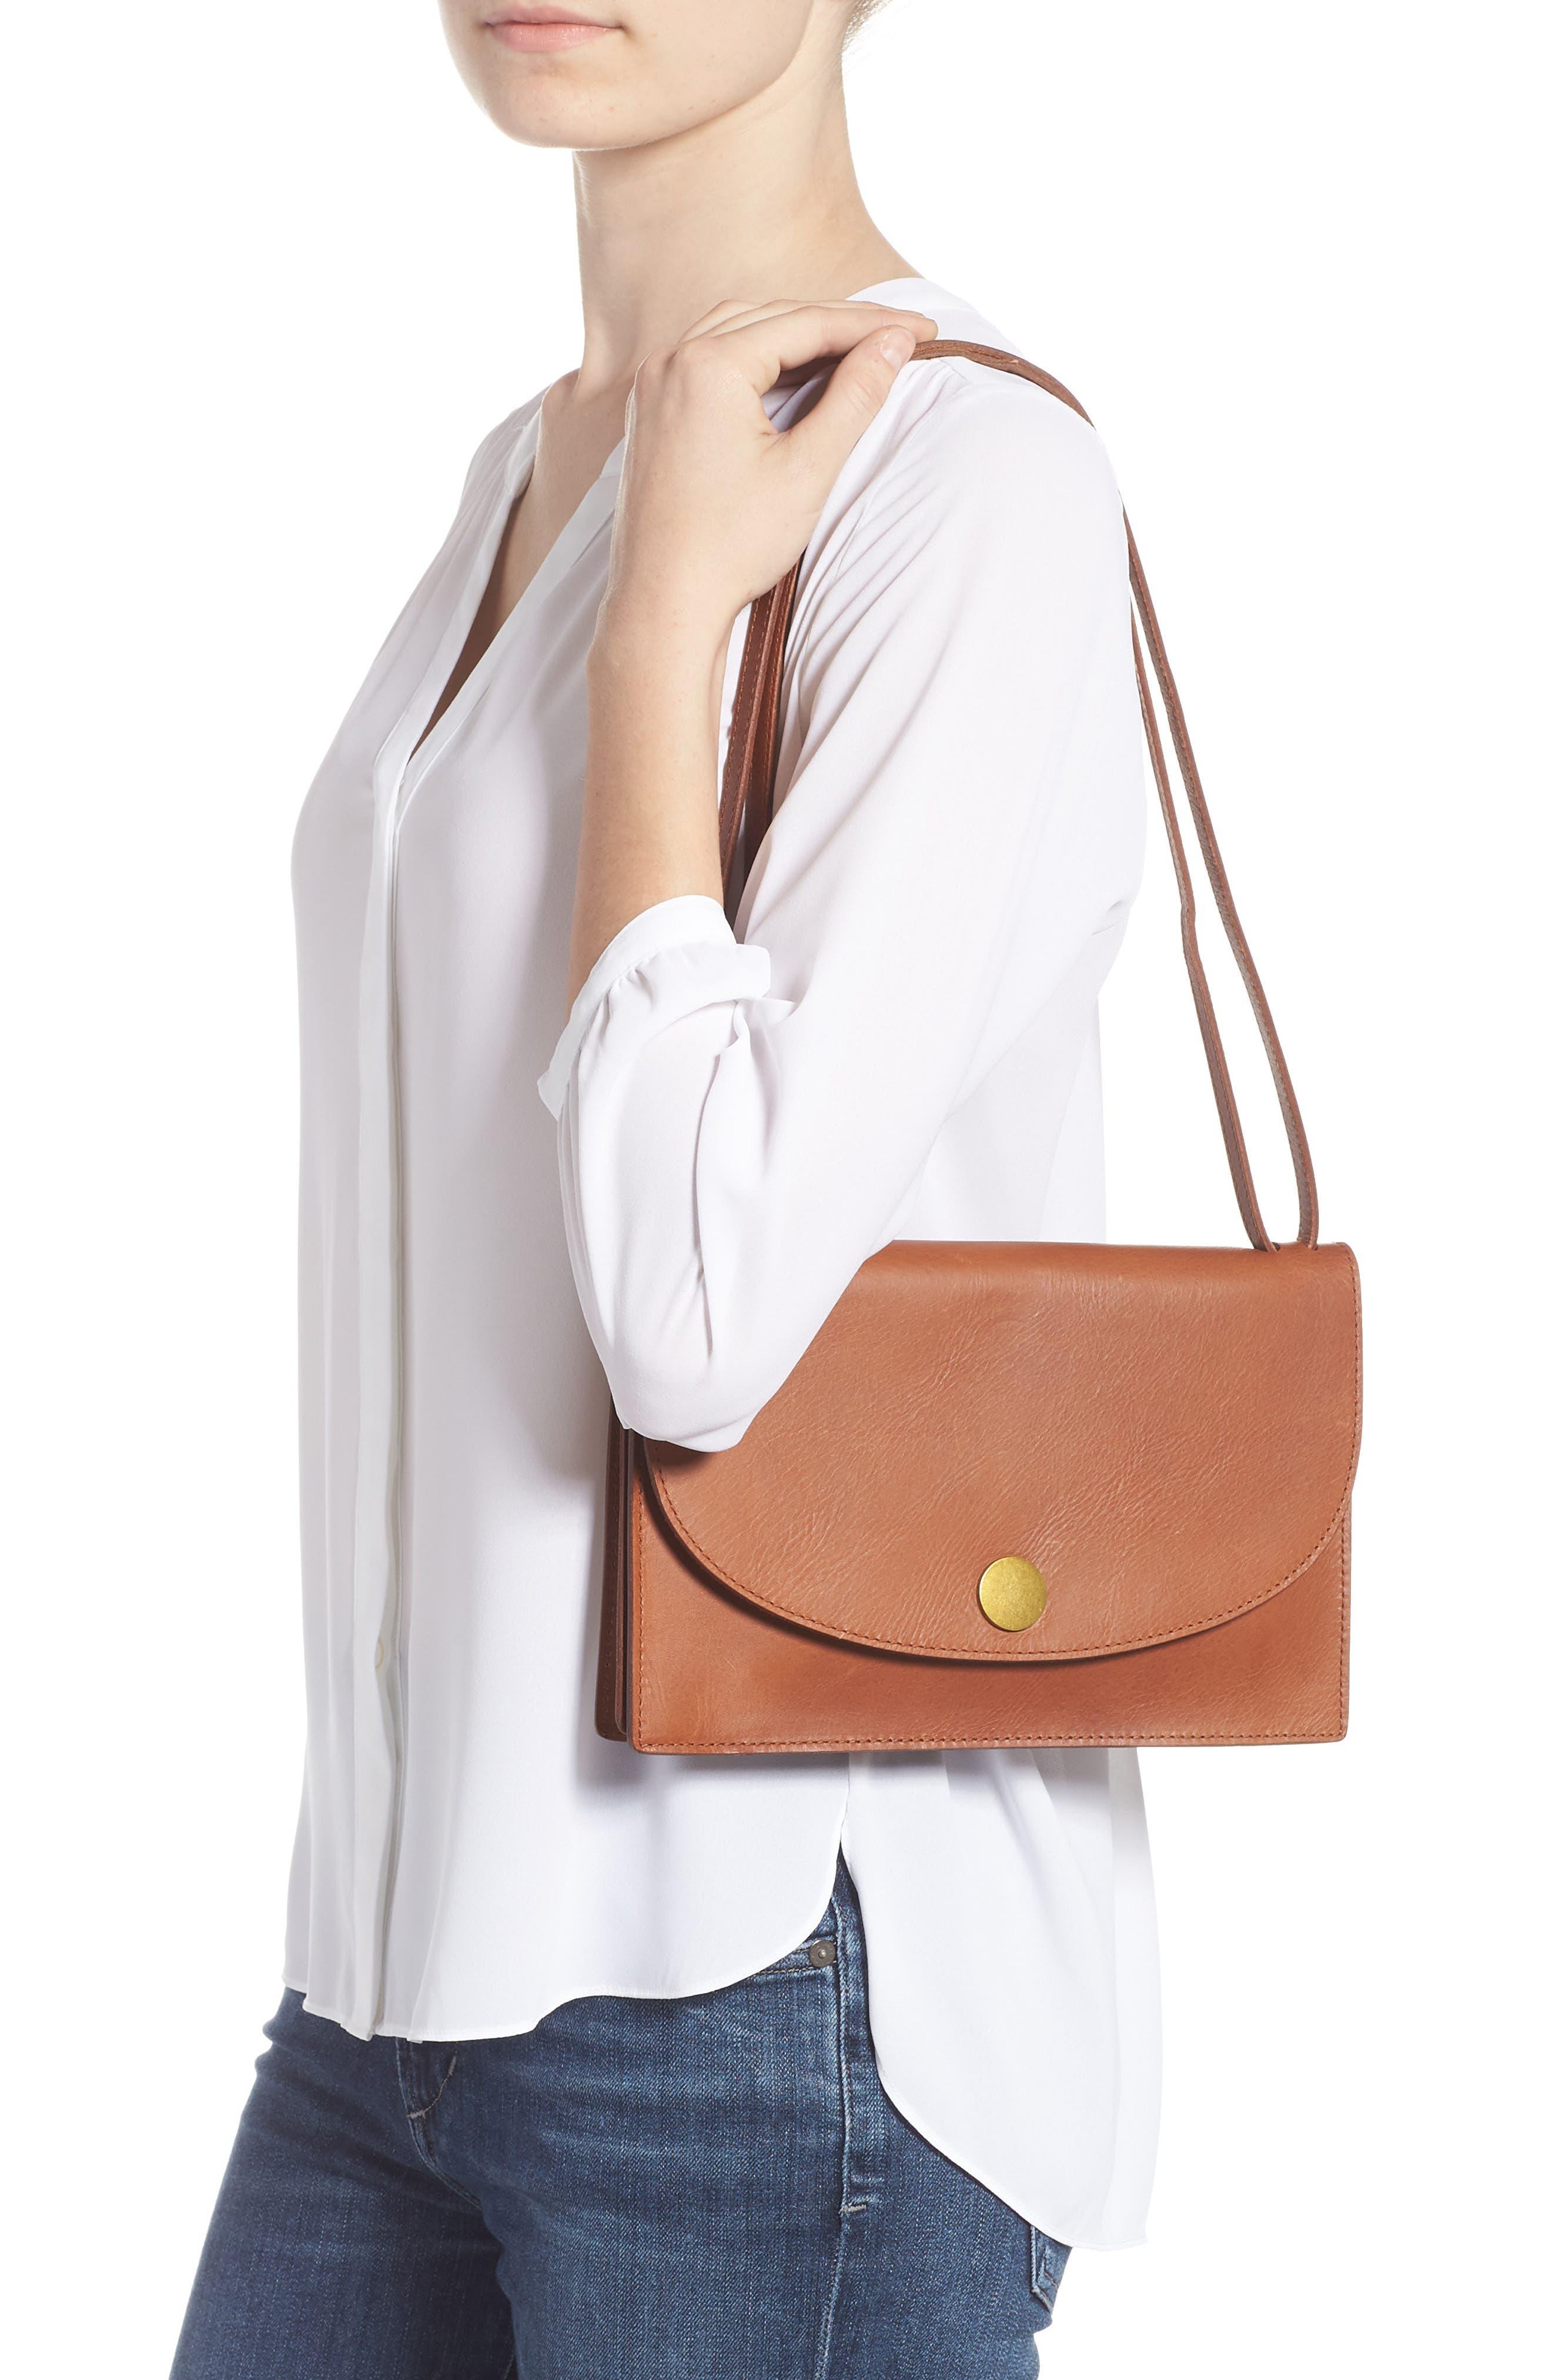 22493a3d6c55 Madewell Shoulder Bags